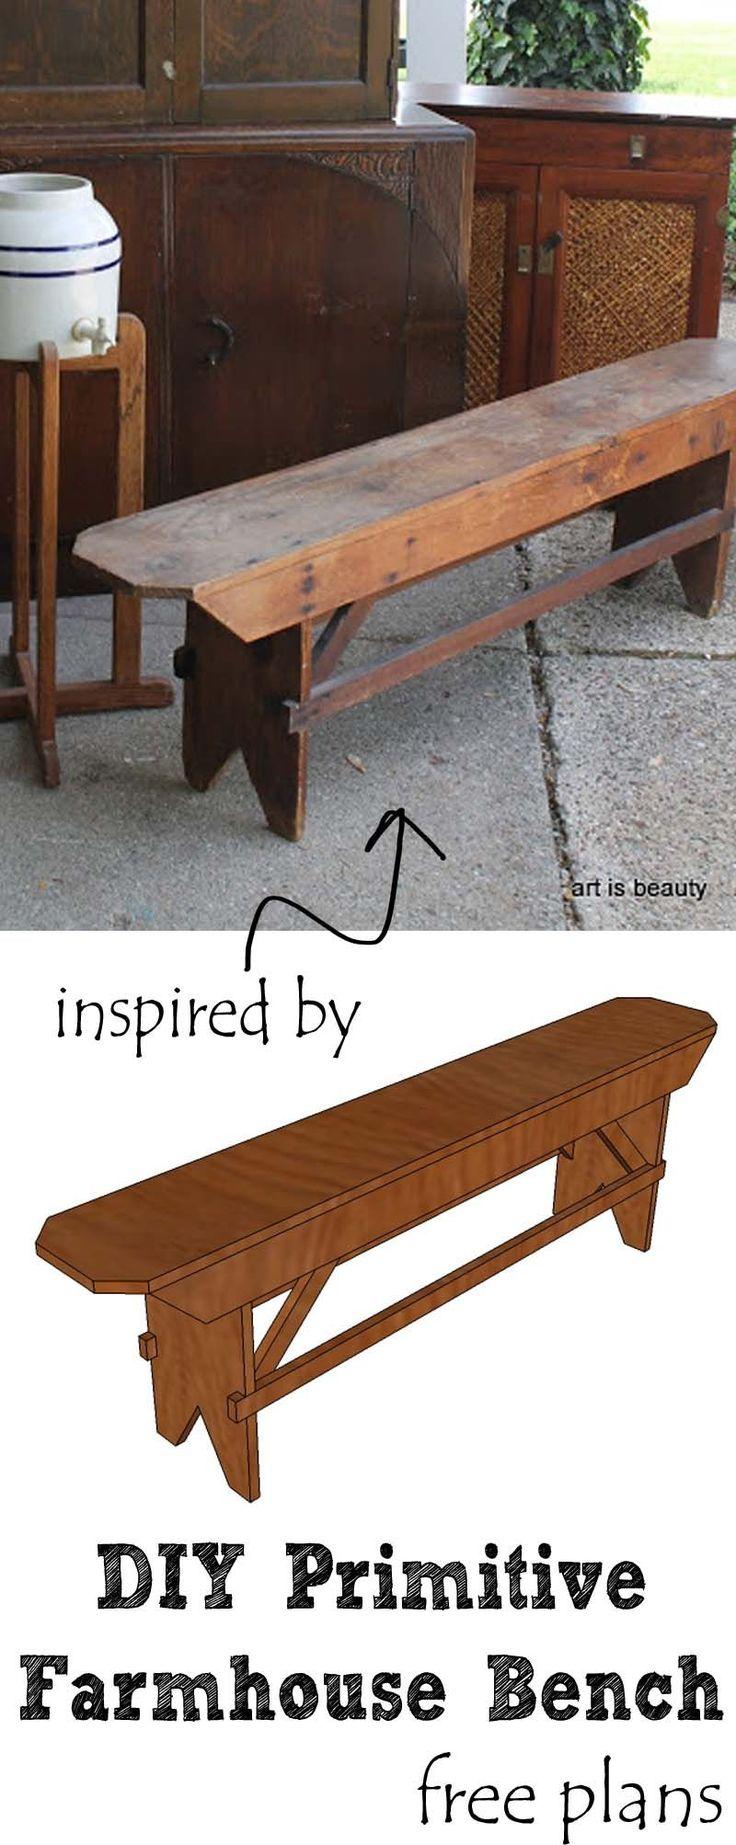 Build a beautiful DIY primitive farmhouse bench